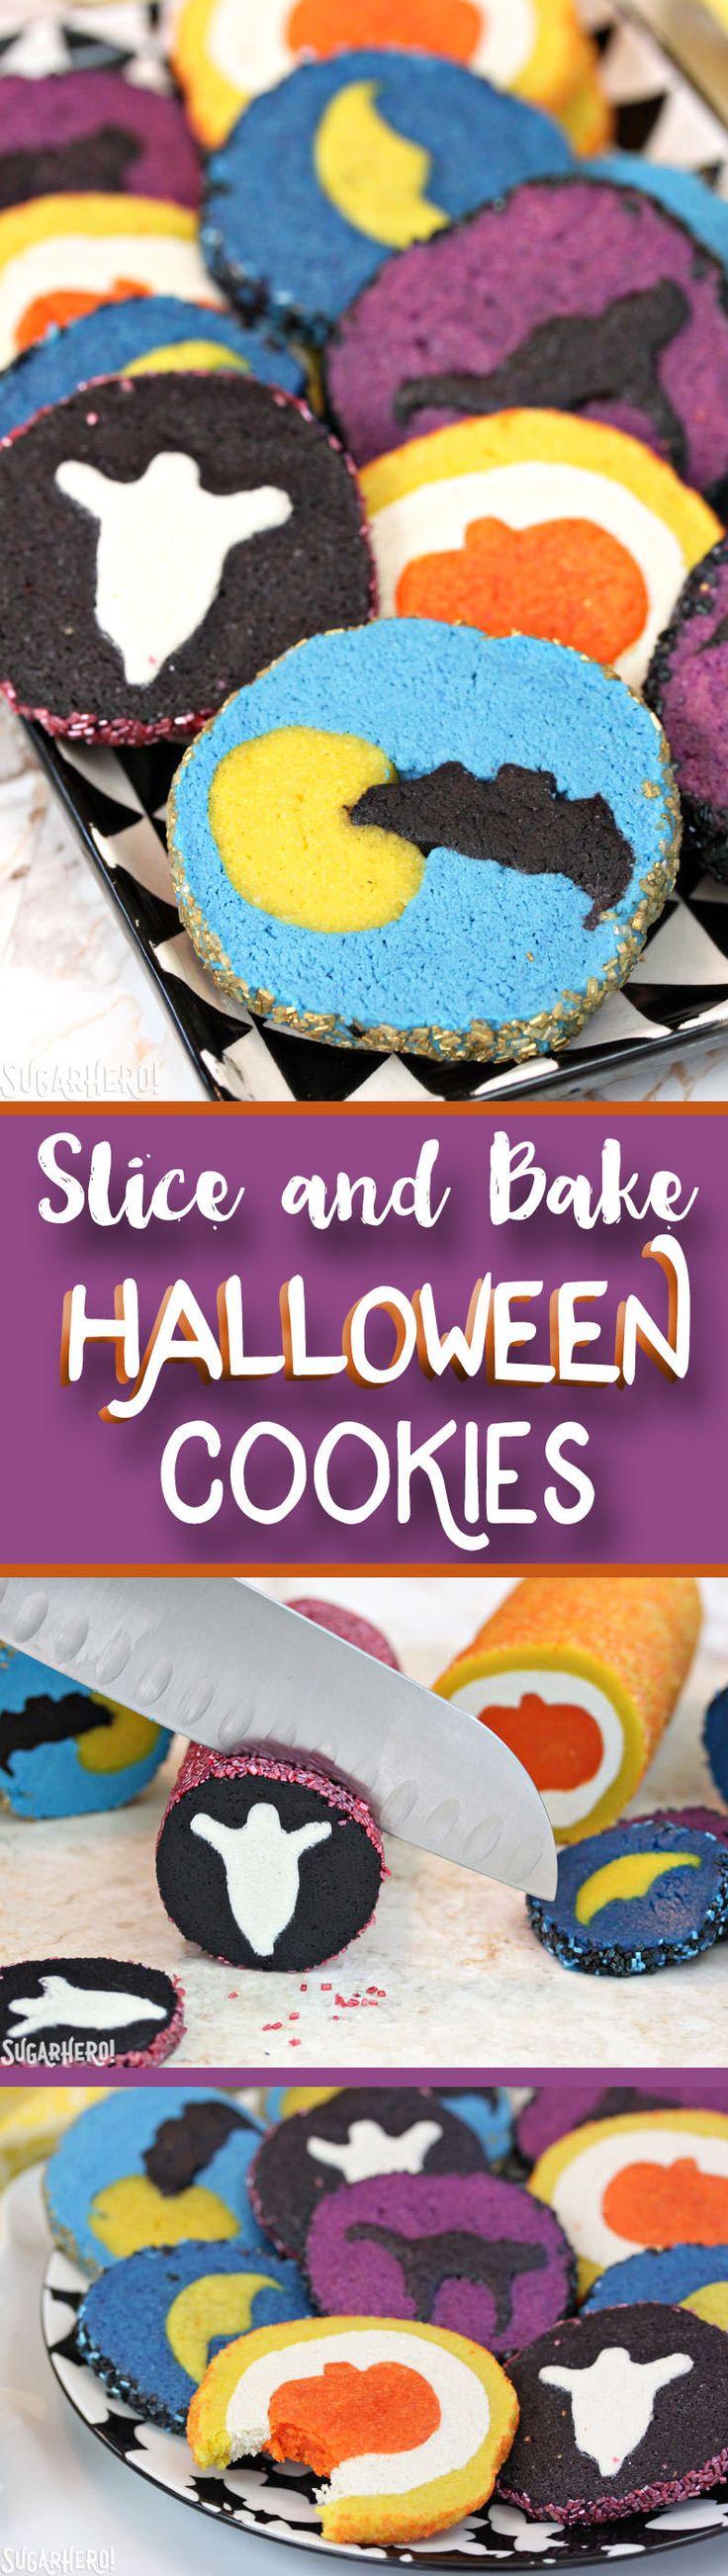 Slice and Bake Halloween Cookies are fun Halloween sugar cookies with surprise designs hidden inside! | From SugarHero.com